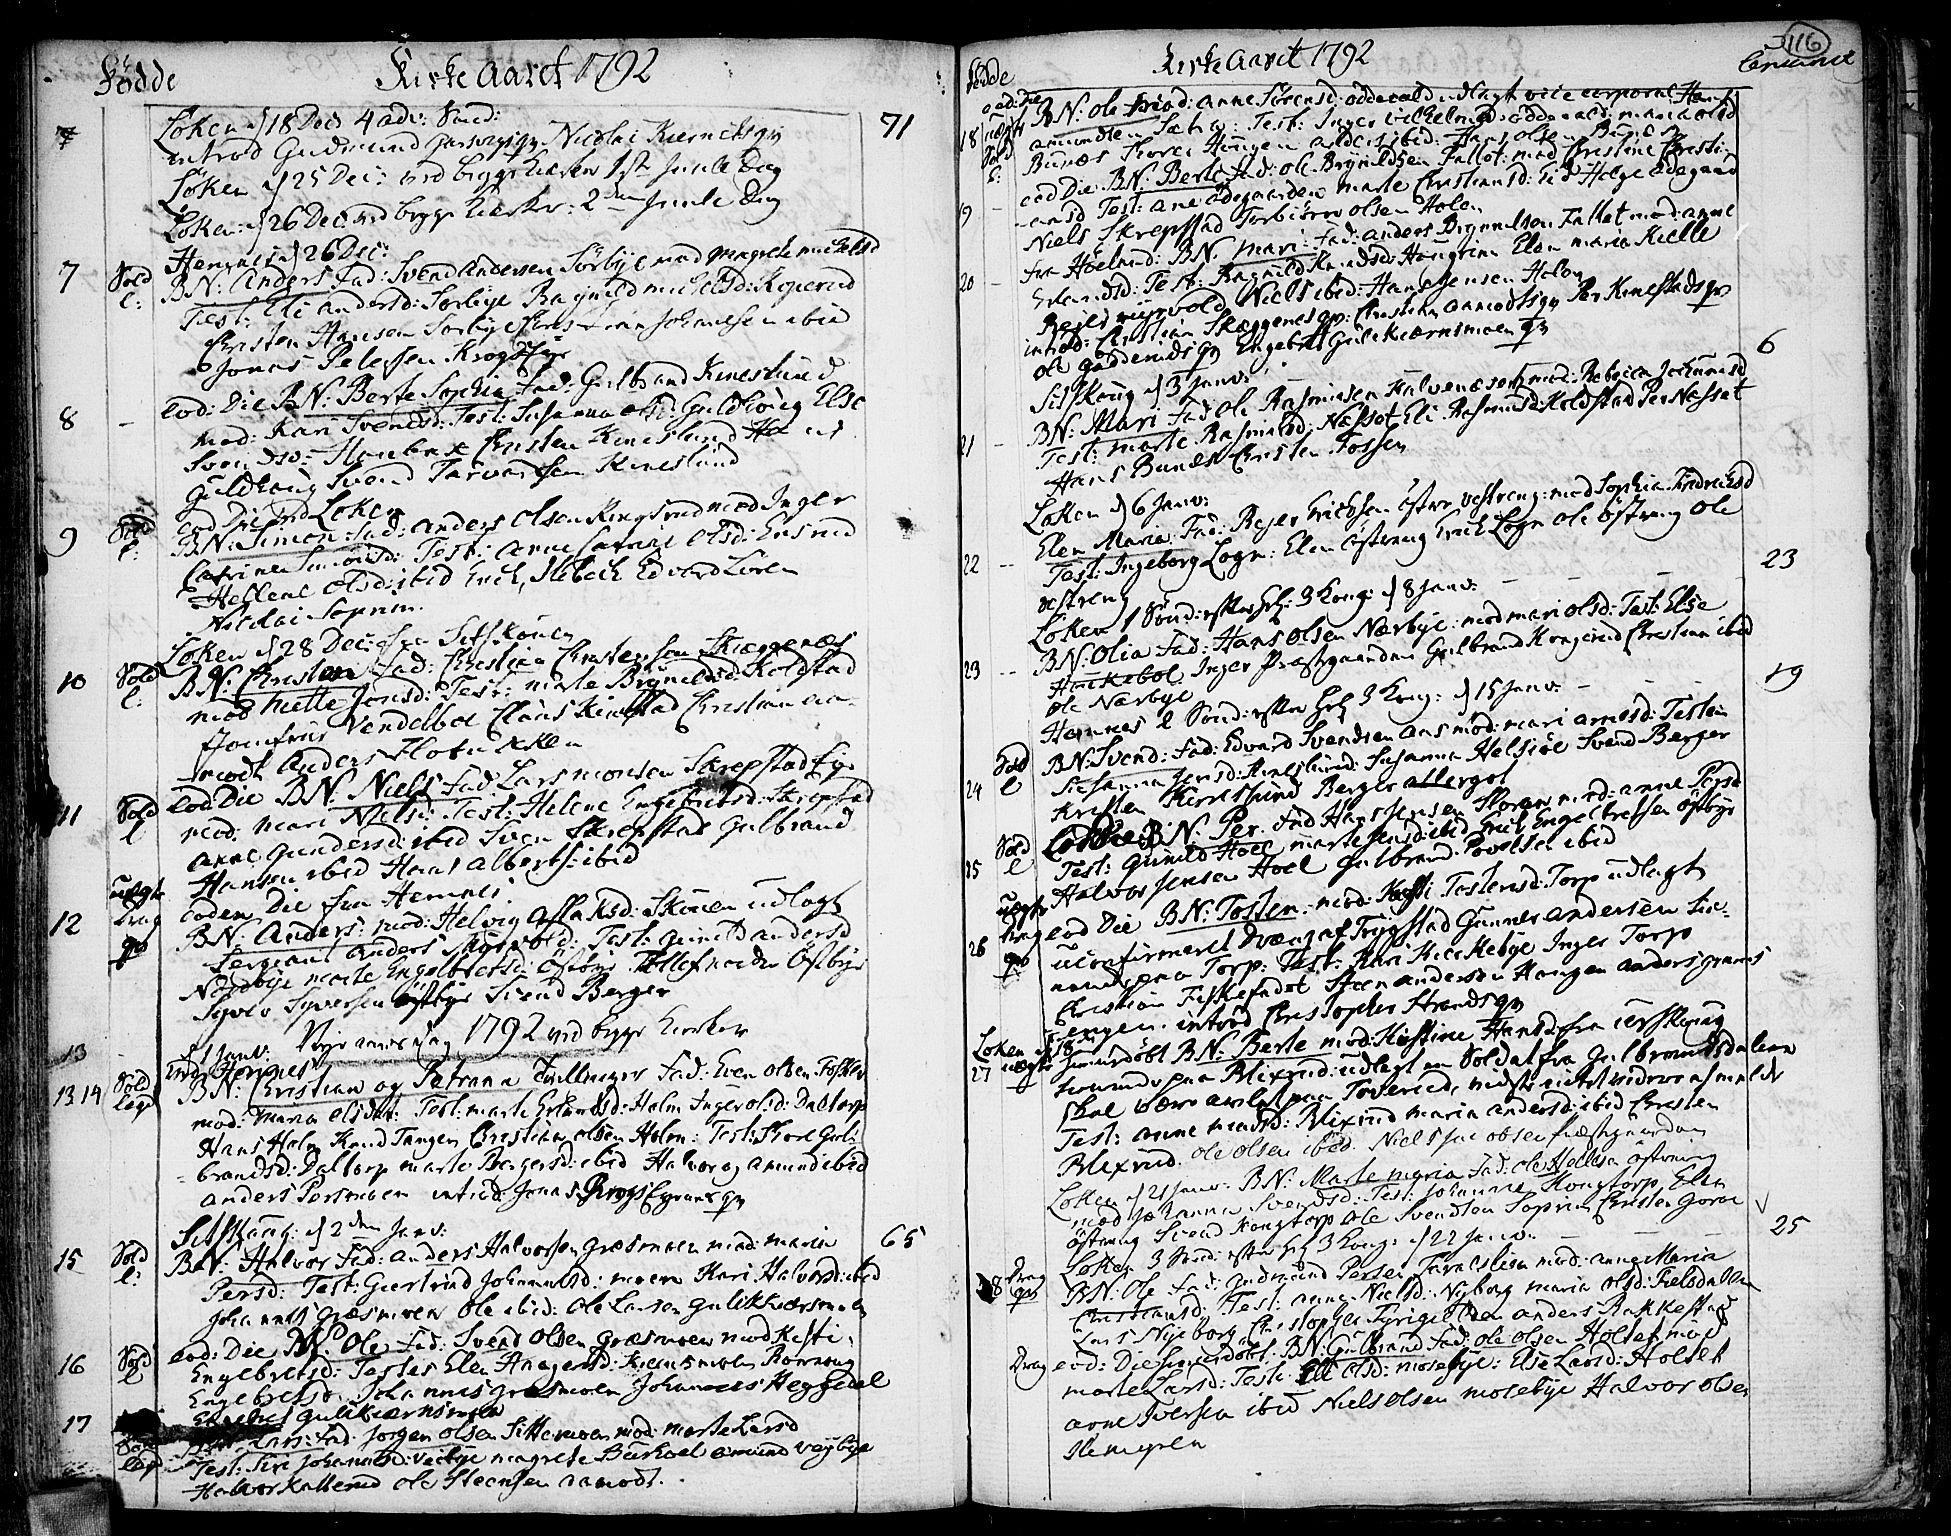 SAO, Høland prestekontor Kirkebøker, F/Fa/L0005: Ministerialbok nr. I 5, 1780-1793, s. 116